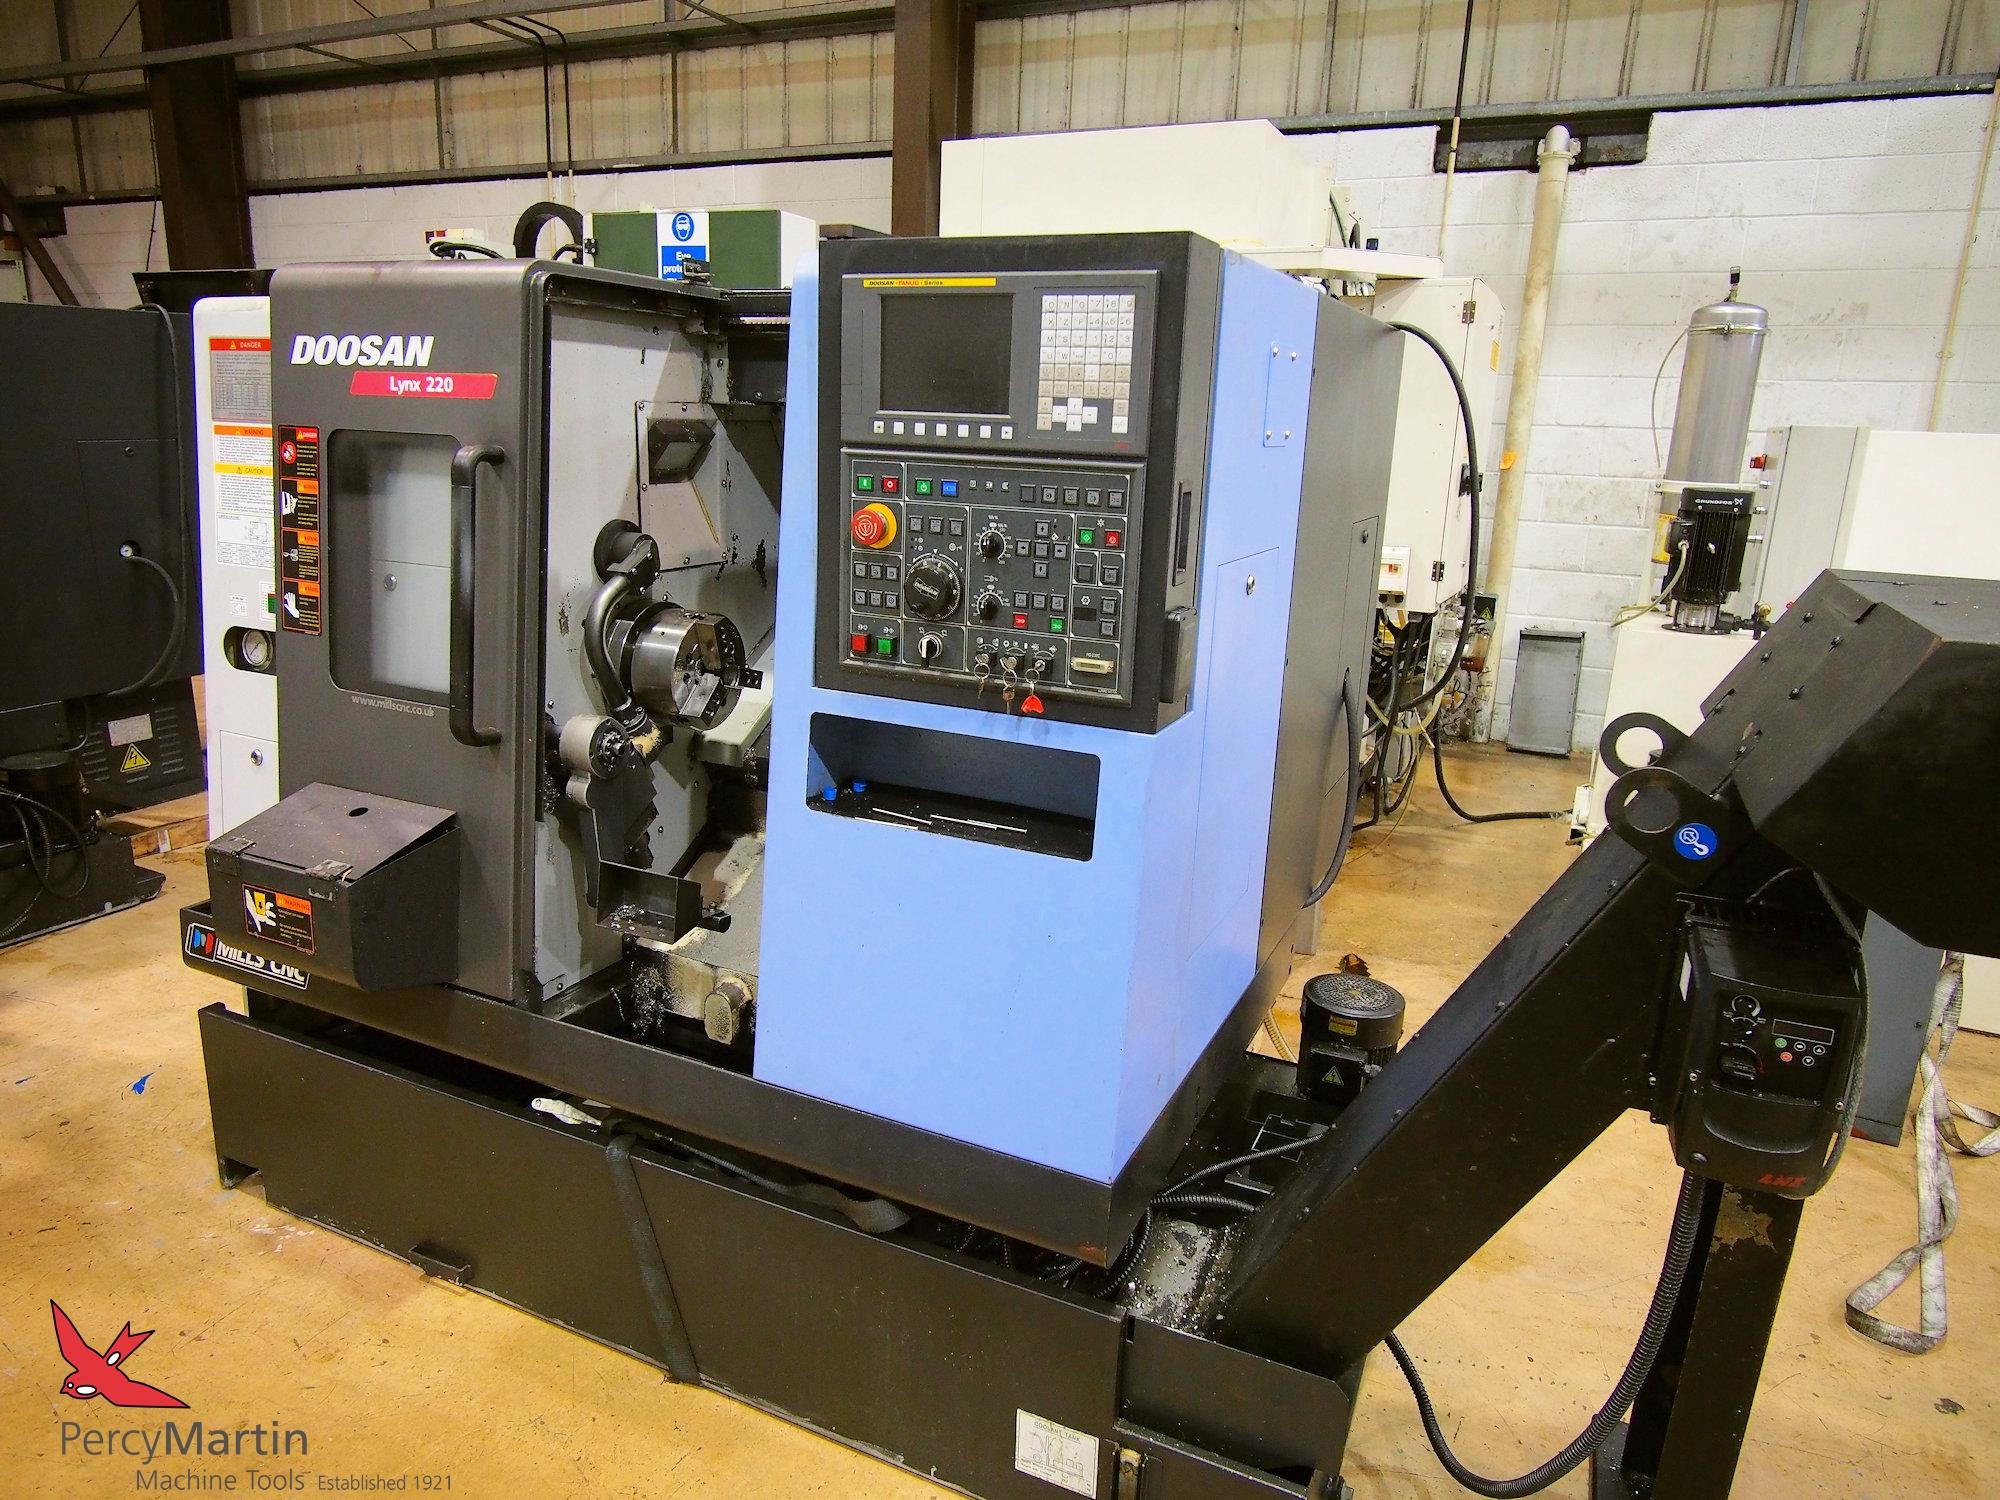 used Doosan Lynx 220B 2013 CNC Lathes for sale | Percy Martin